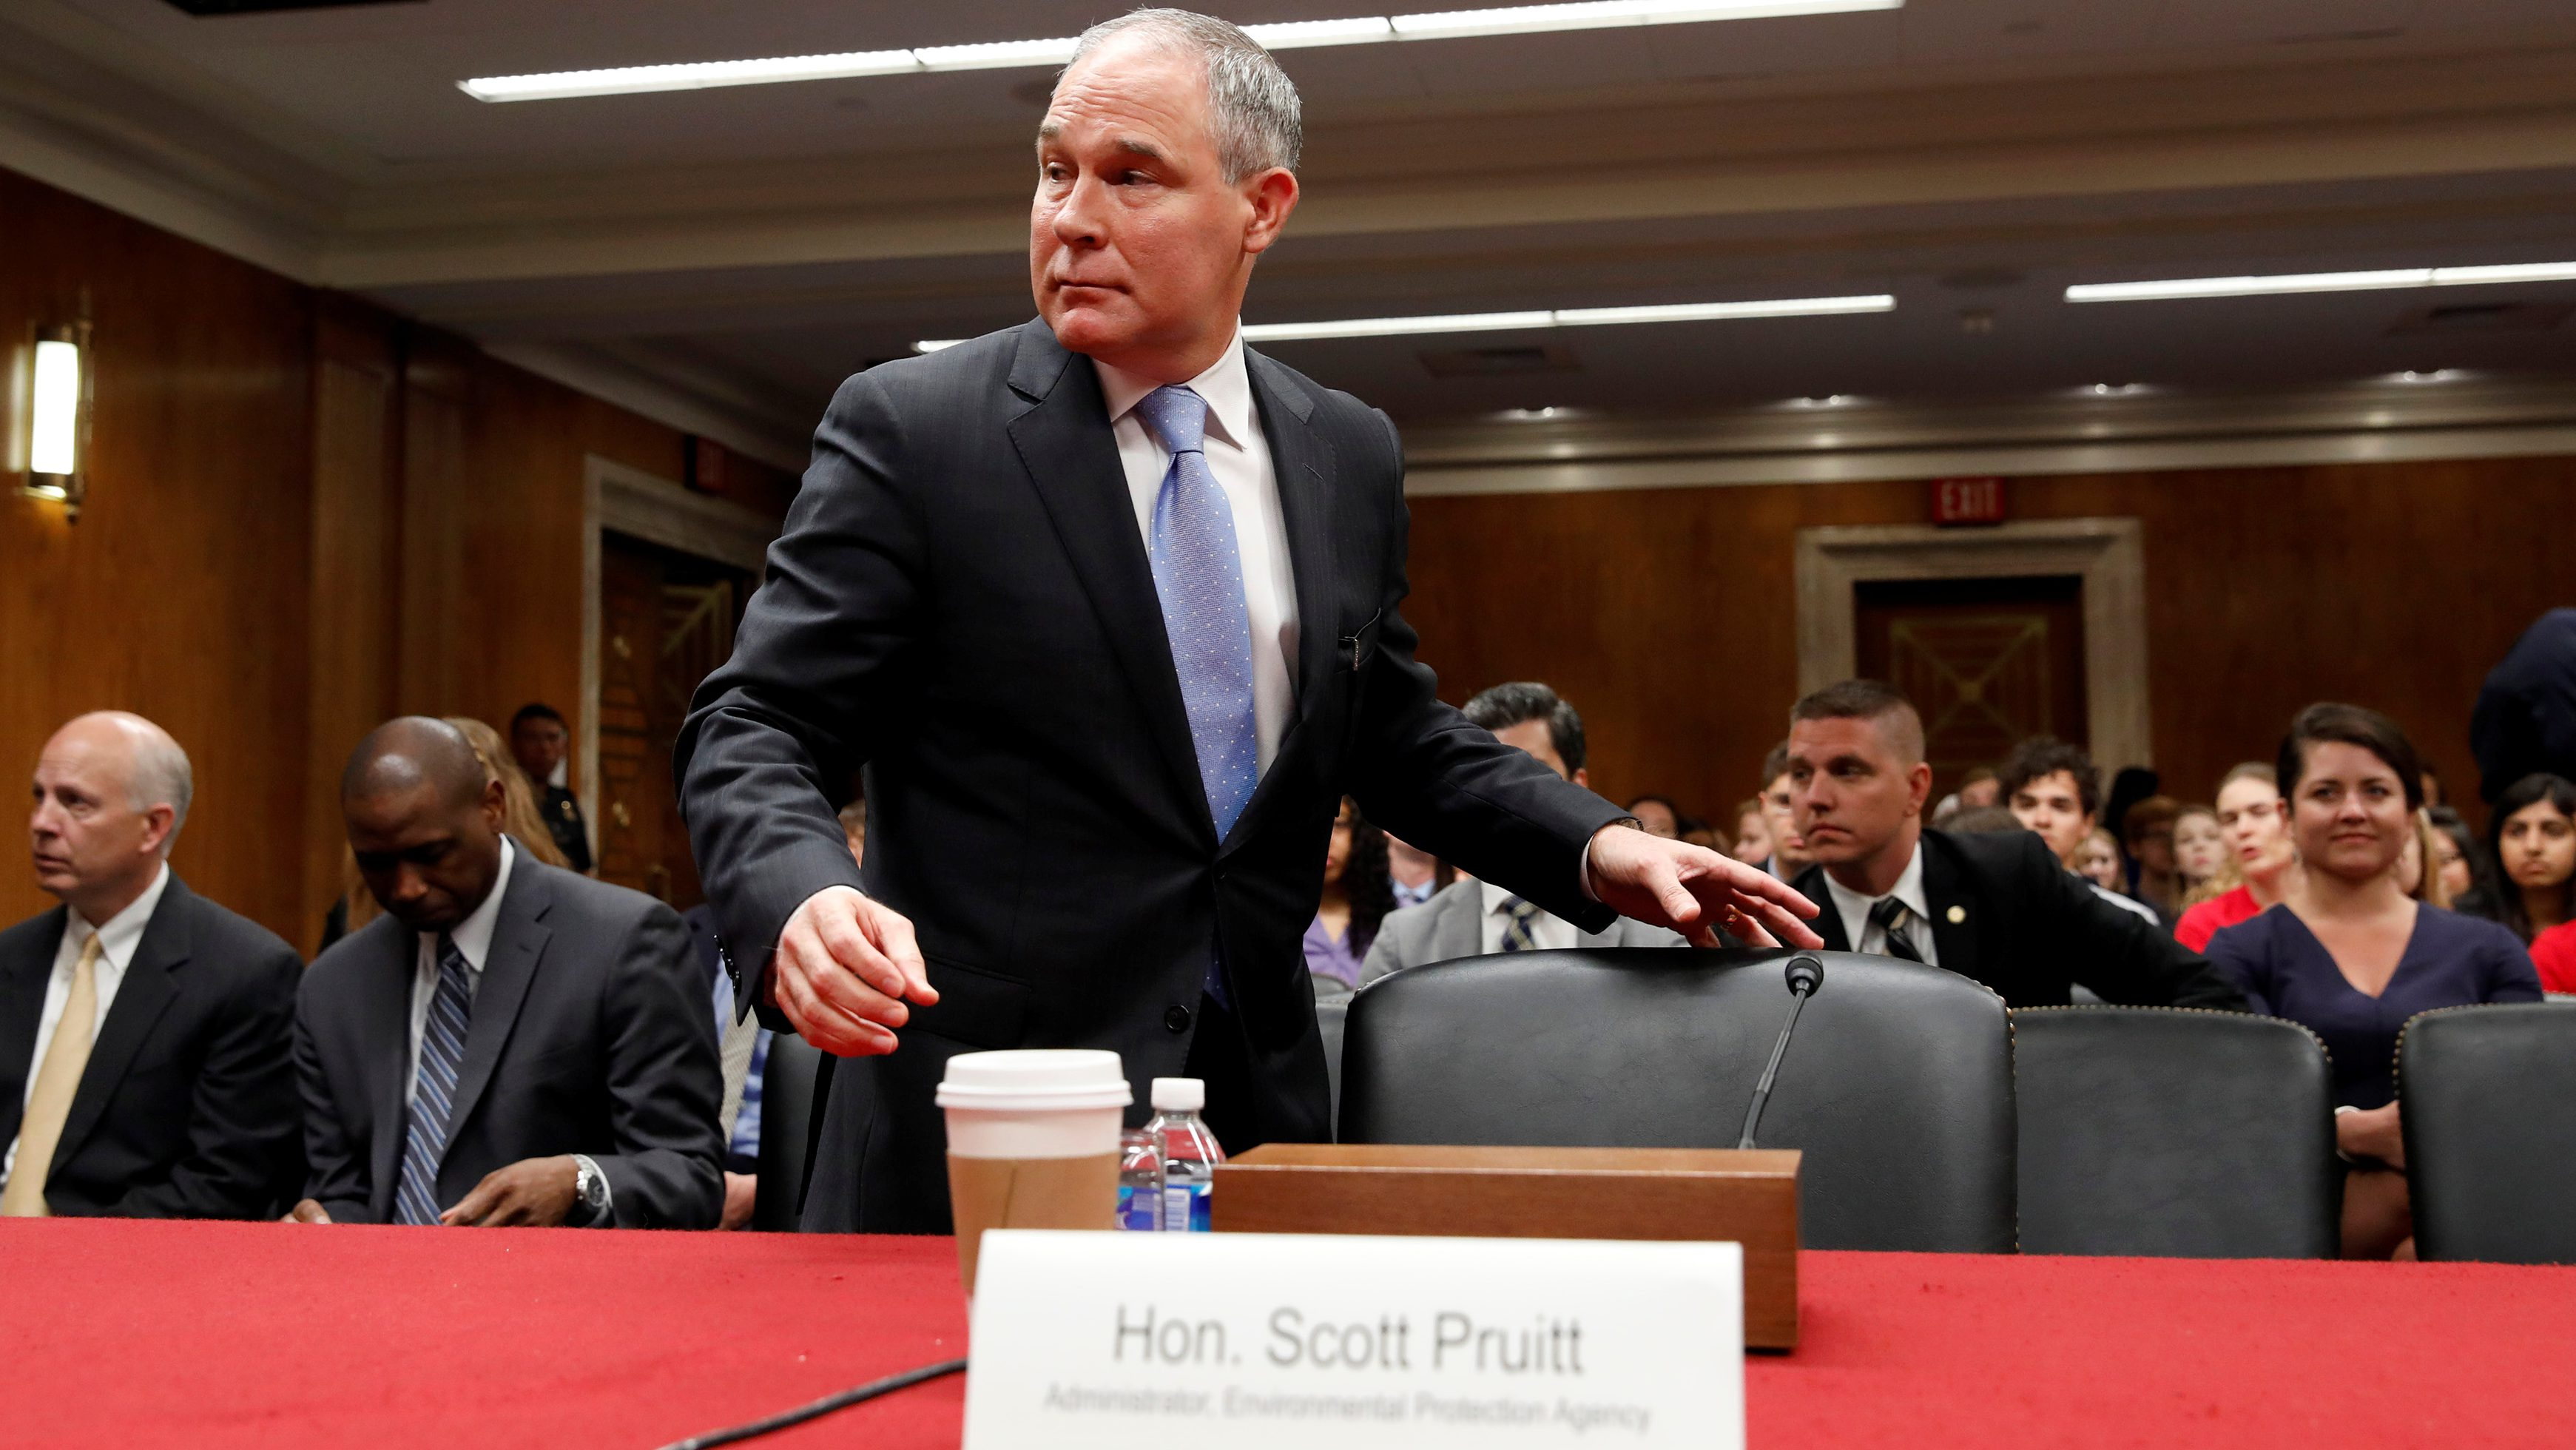 Scott Pruitt, head of the US Environmental Protection Agency